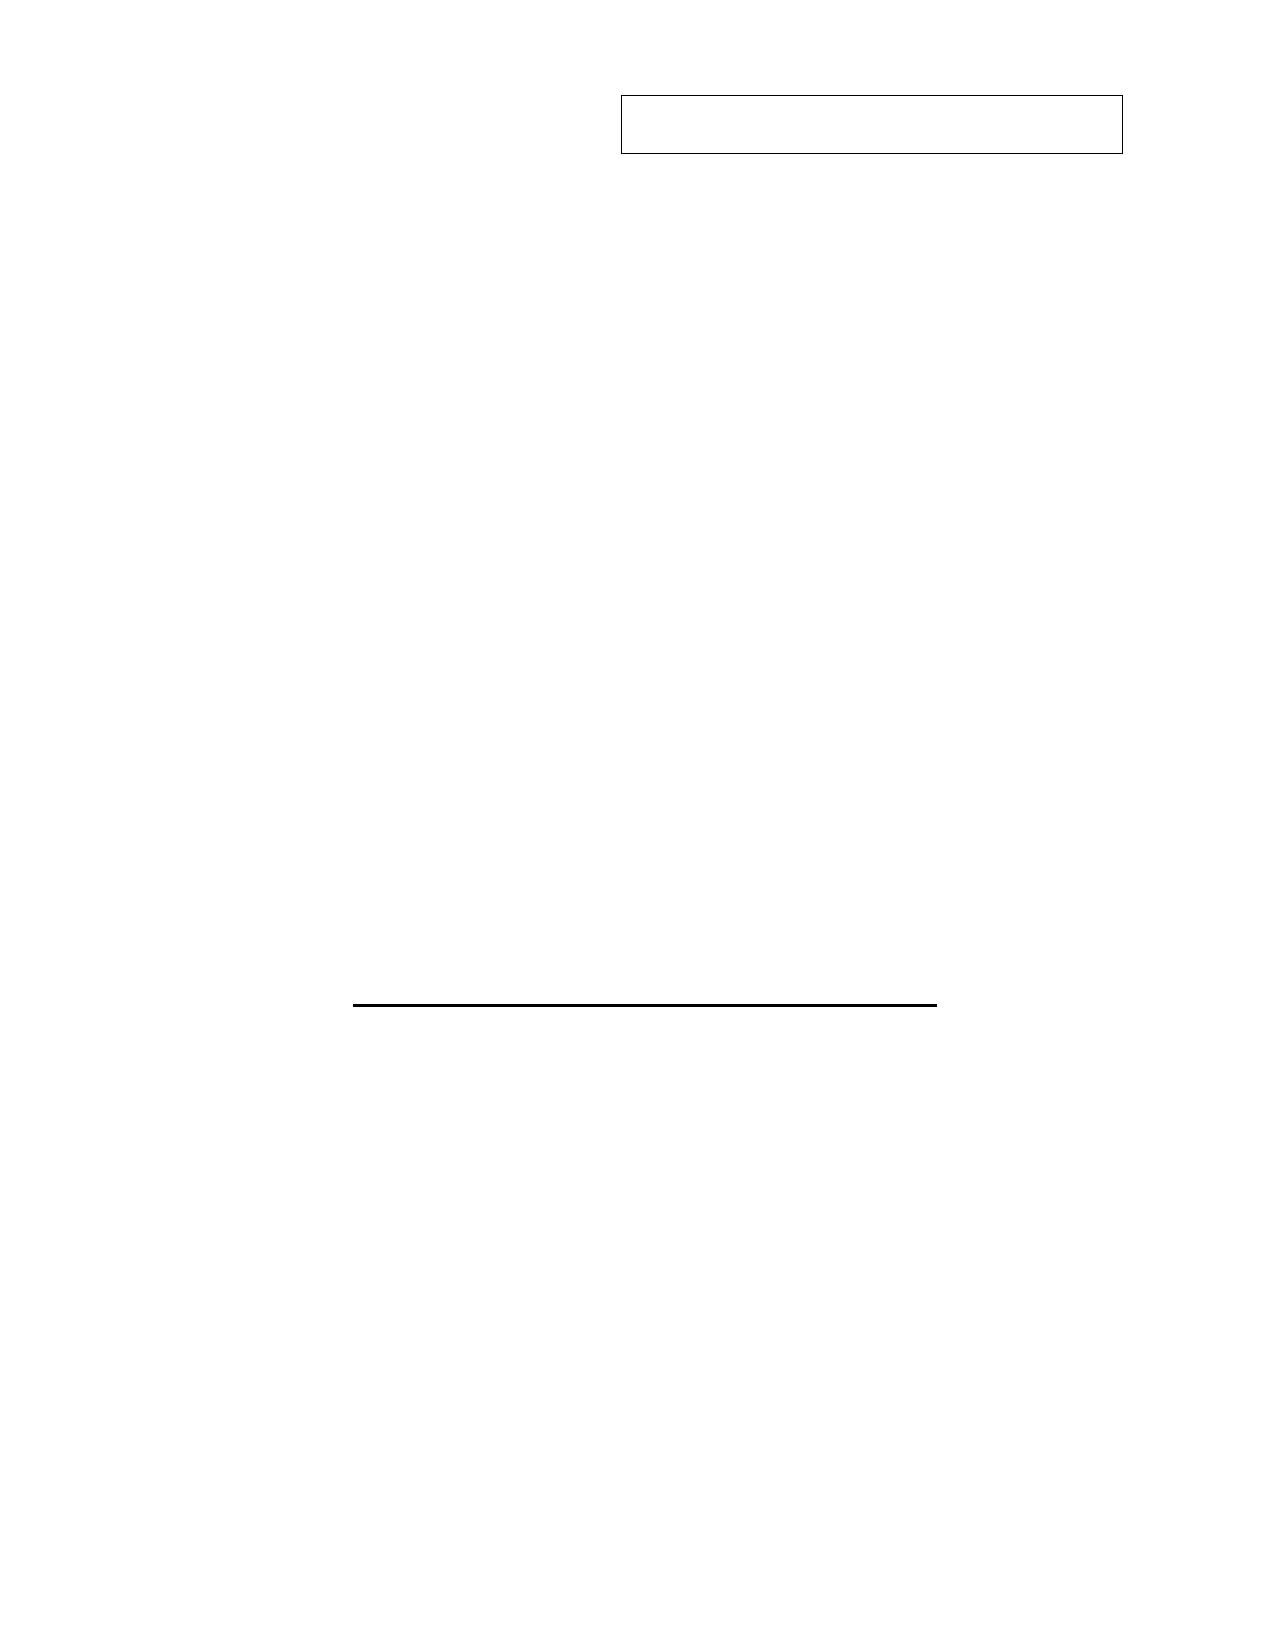 T-55105D121J-FW-A-AAN دیتاشیت PDF